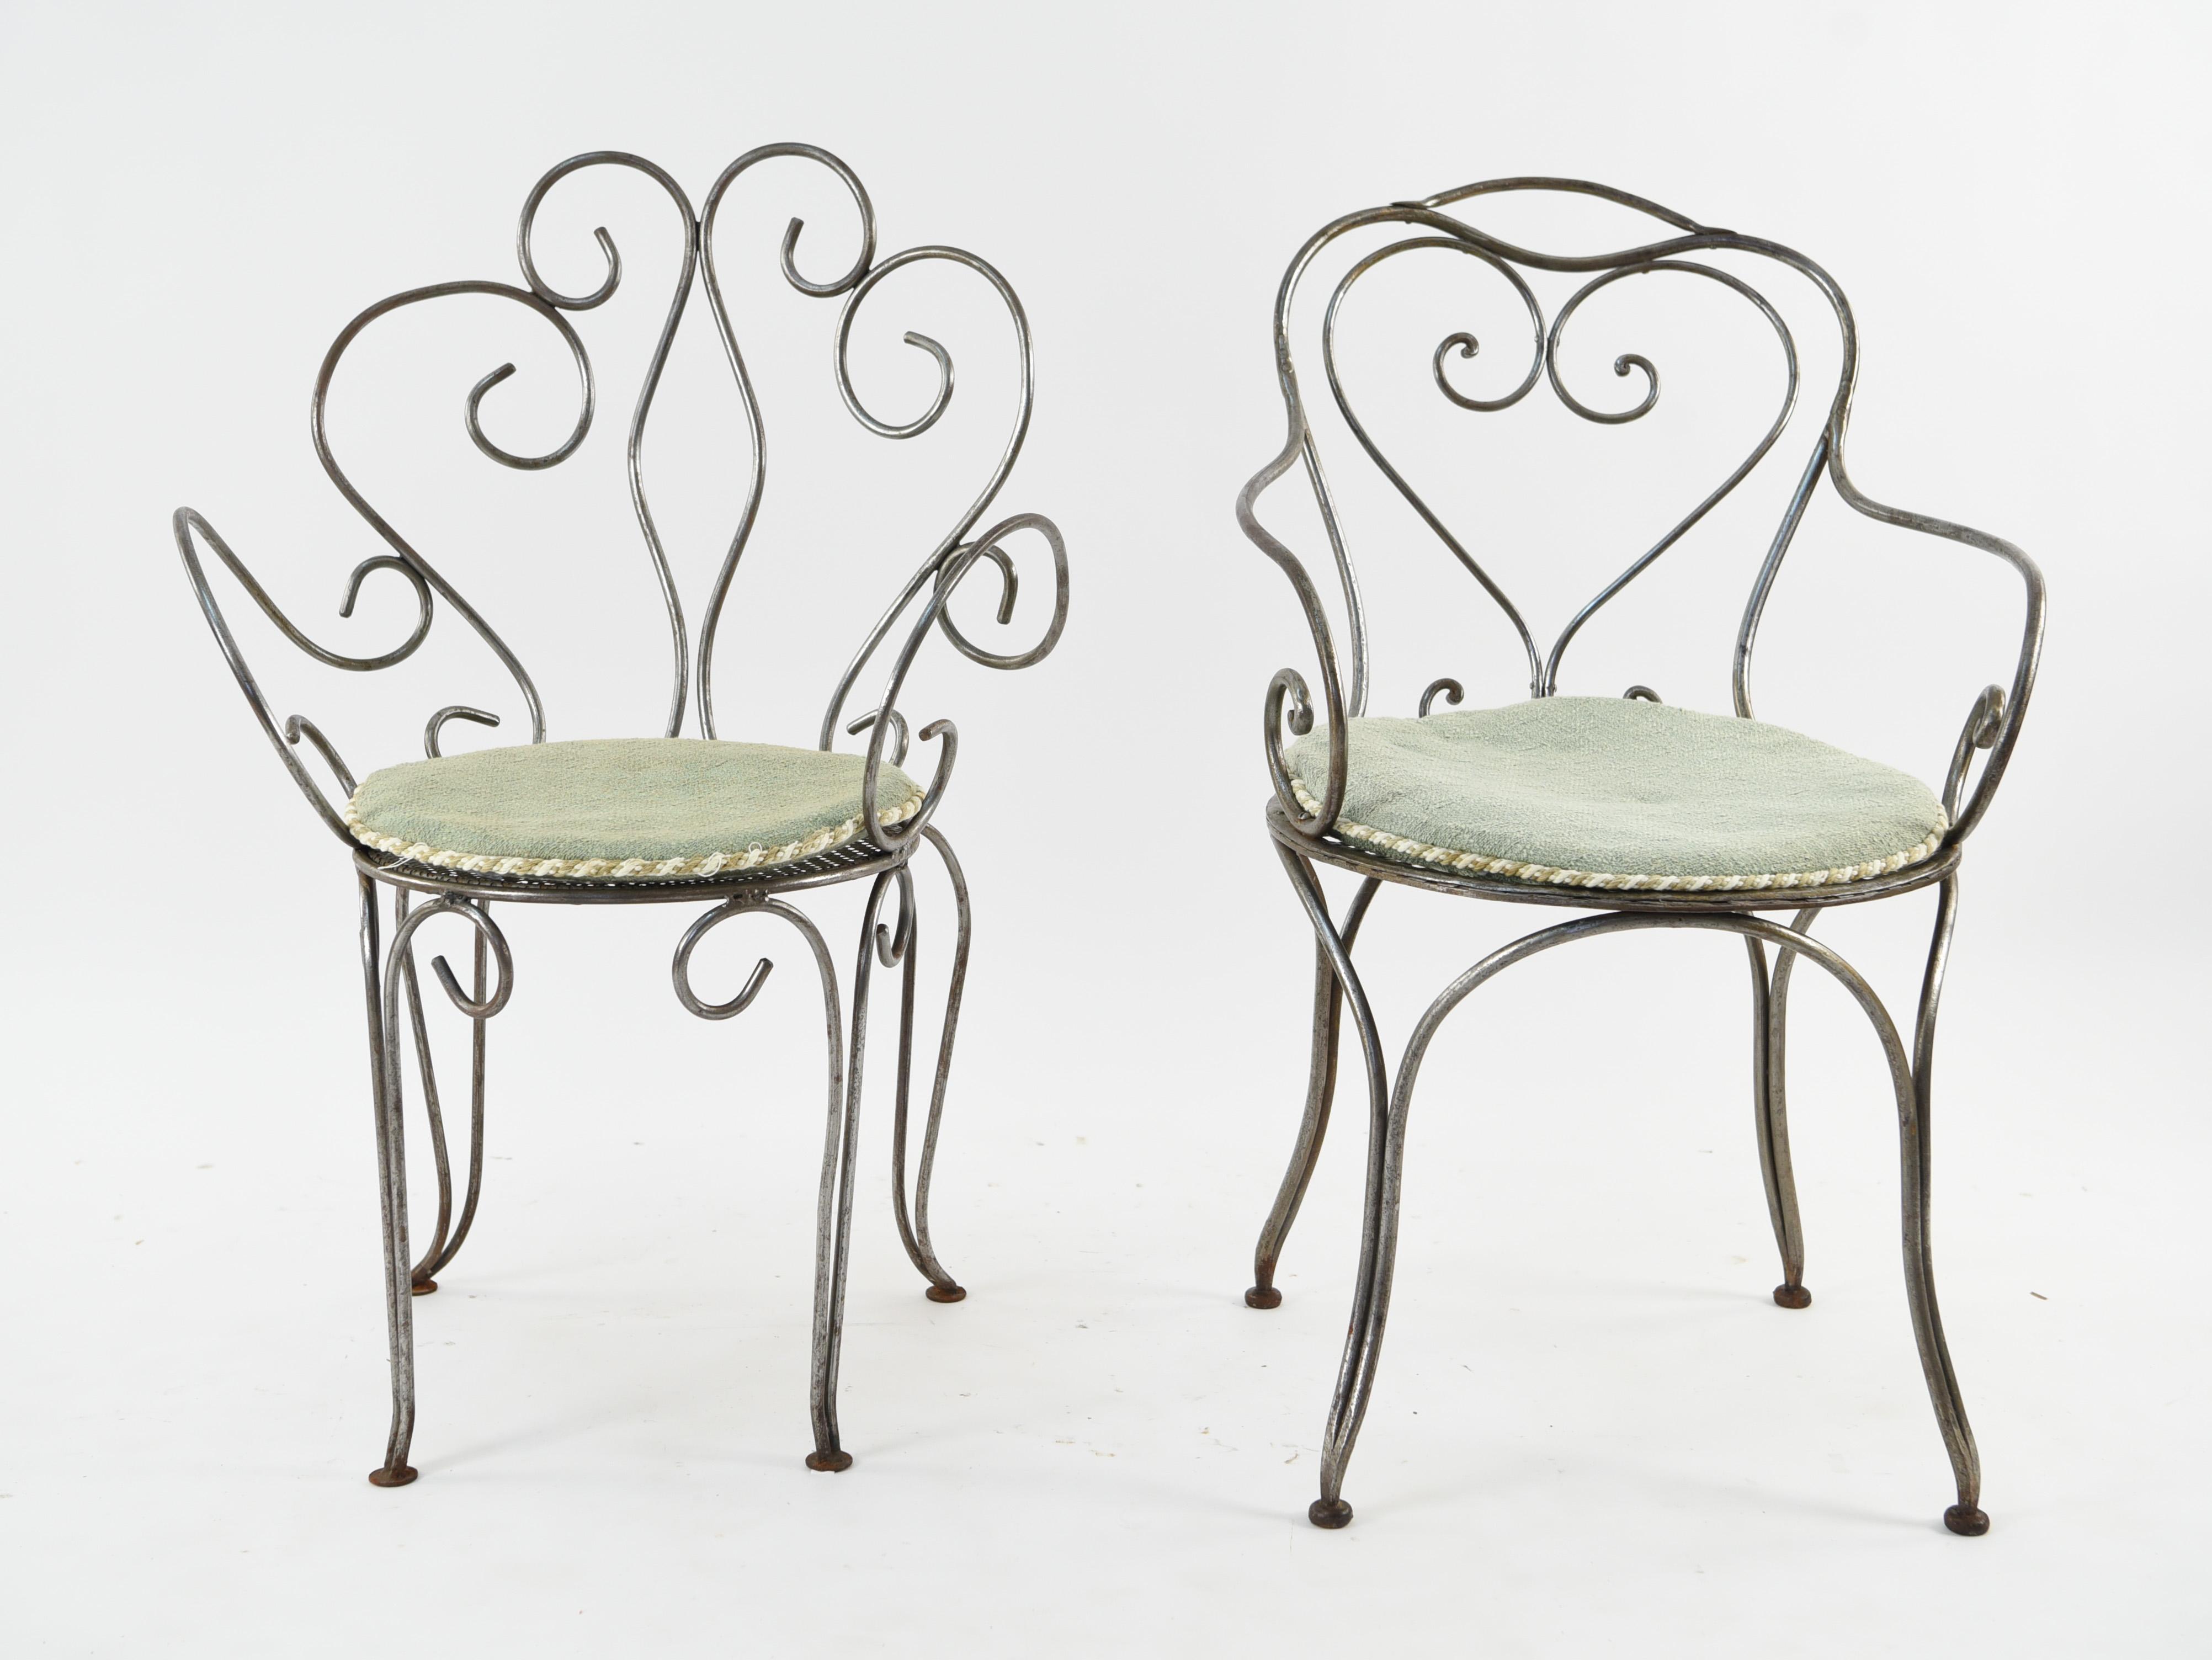 Woven metal furniture Rocker 2 Scrolling Iron Chairs W Woven Metal Seats The Home Depot 2 Scrolling Iron Chairs W Woven Metal Seats Lofty Marketplace